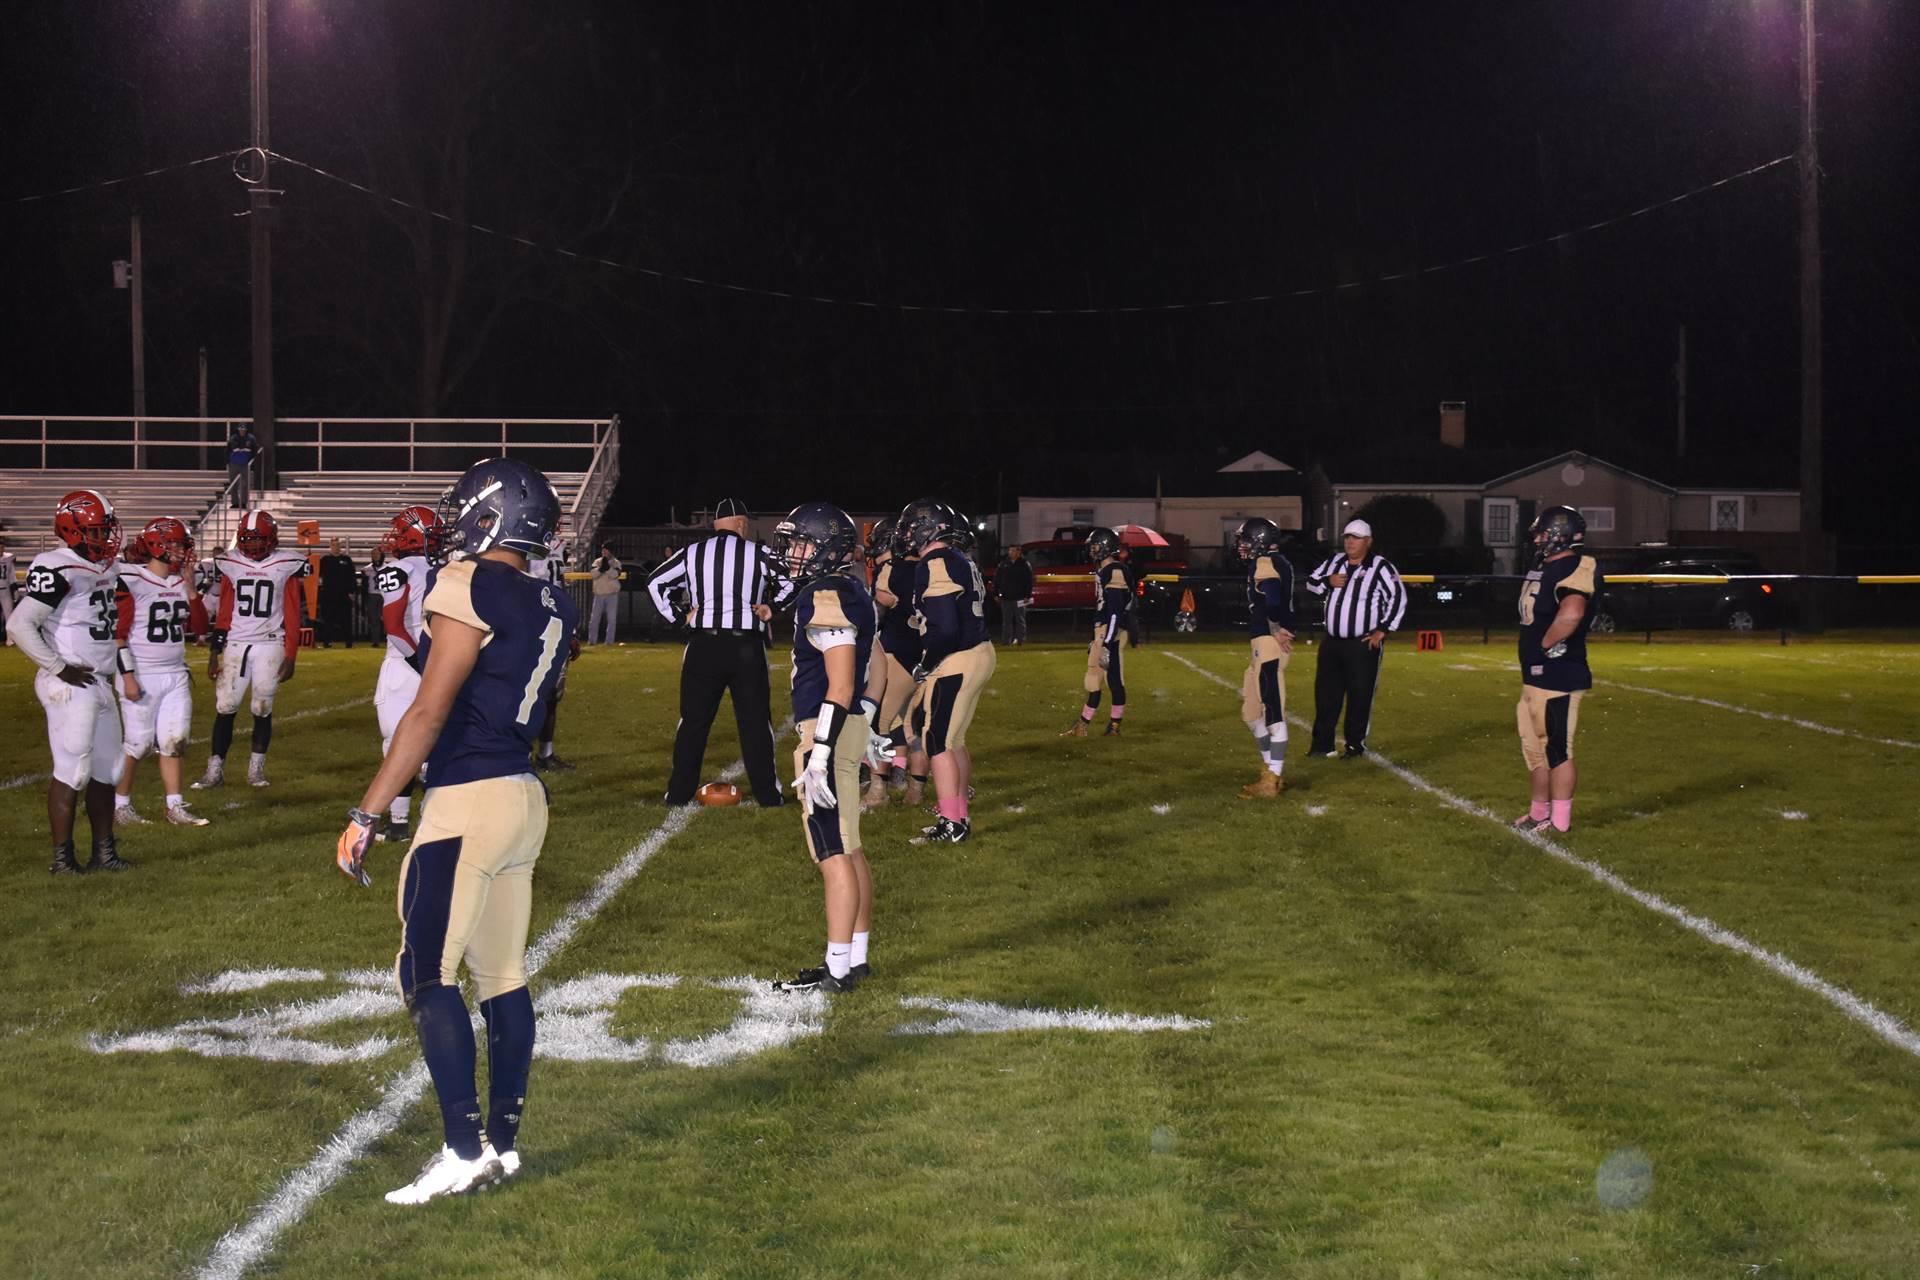 Brookfield Varisty football team on offense